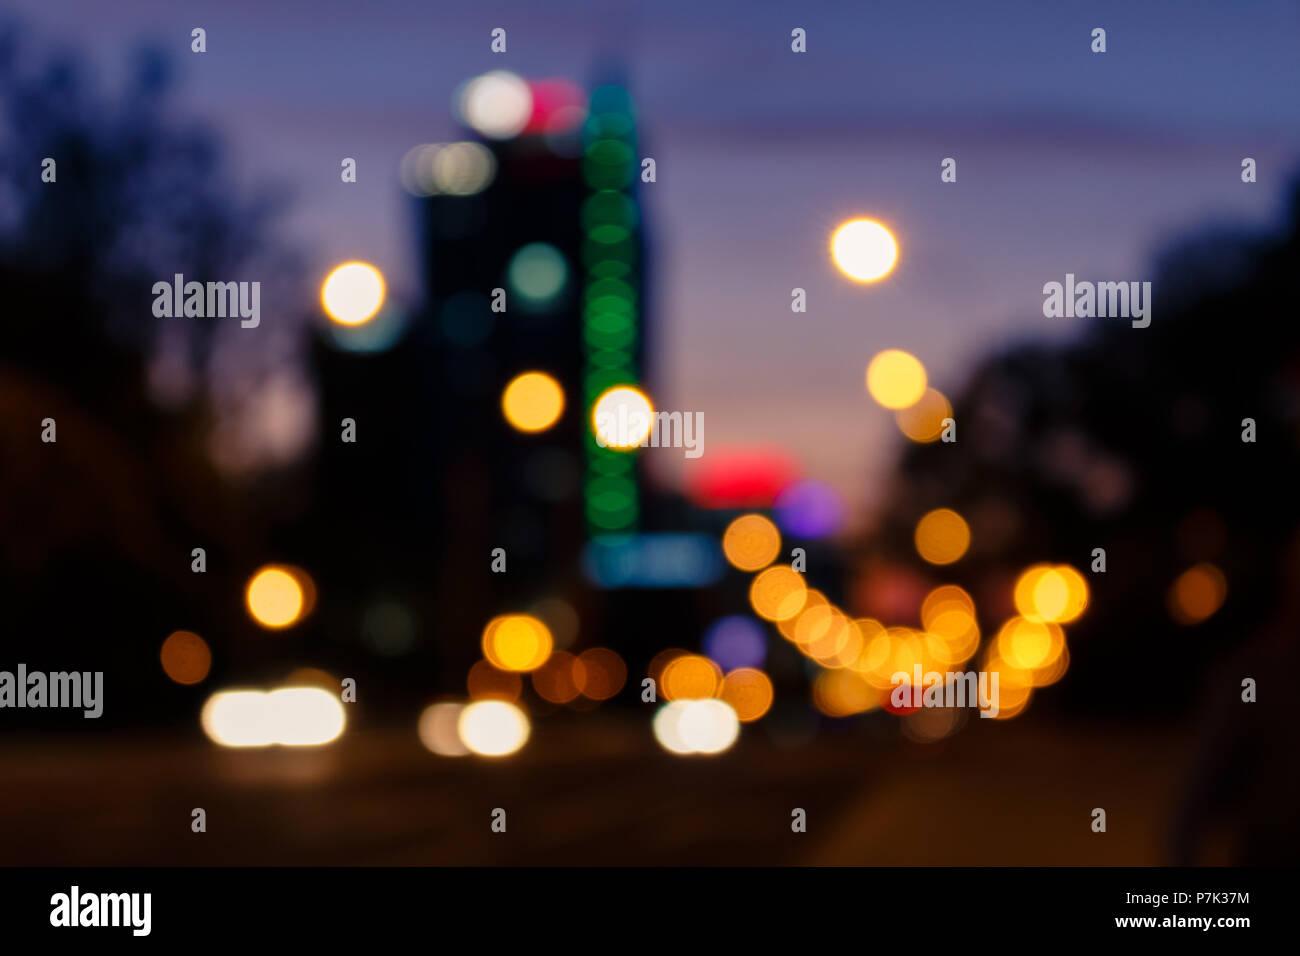 Blurred night city life, road traffic, illuminate. Sunset background. - Stock Image